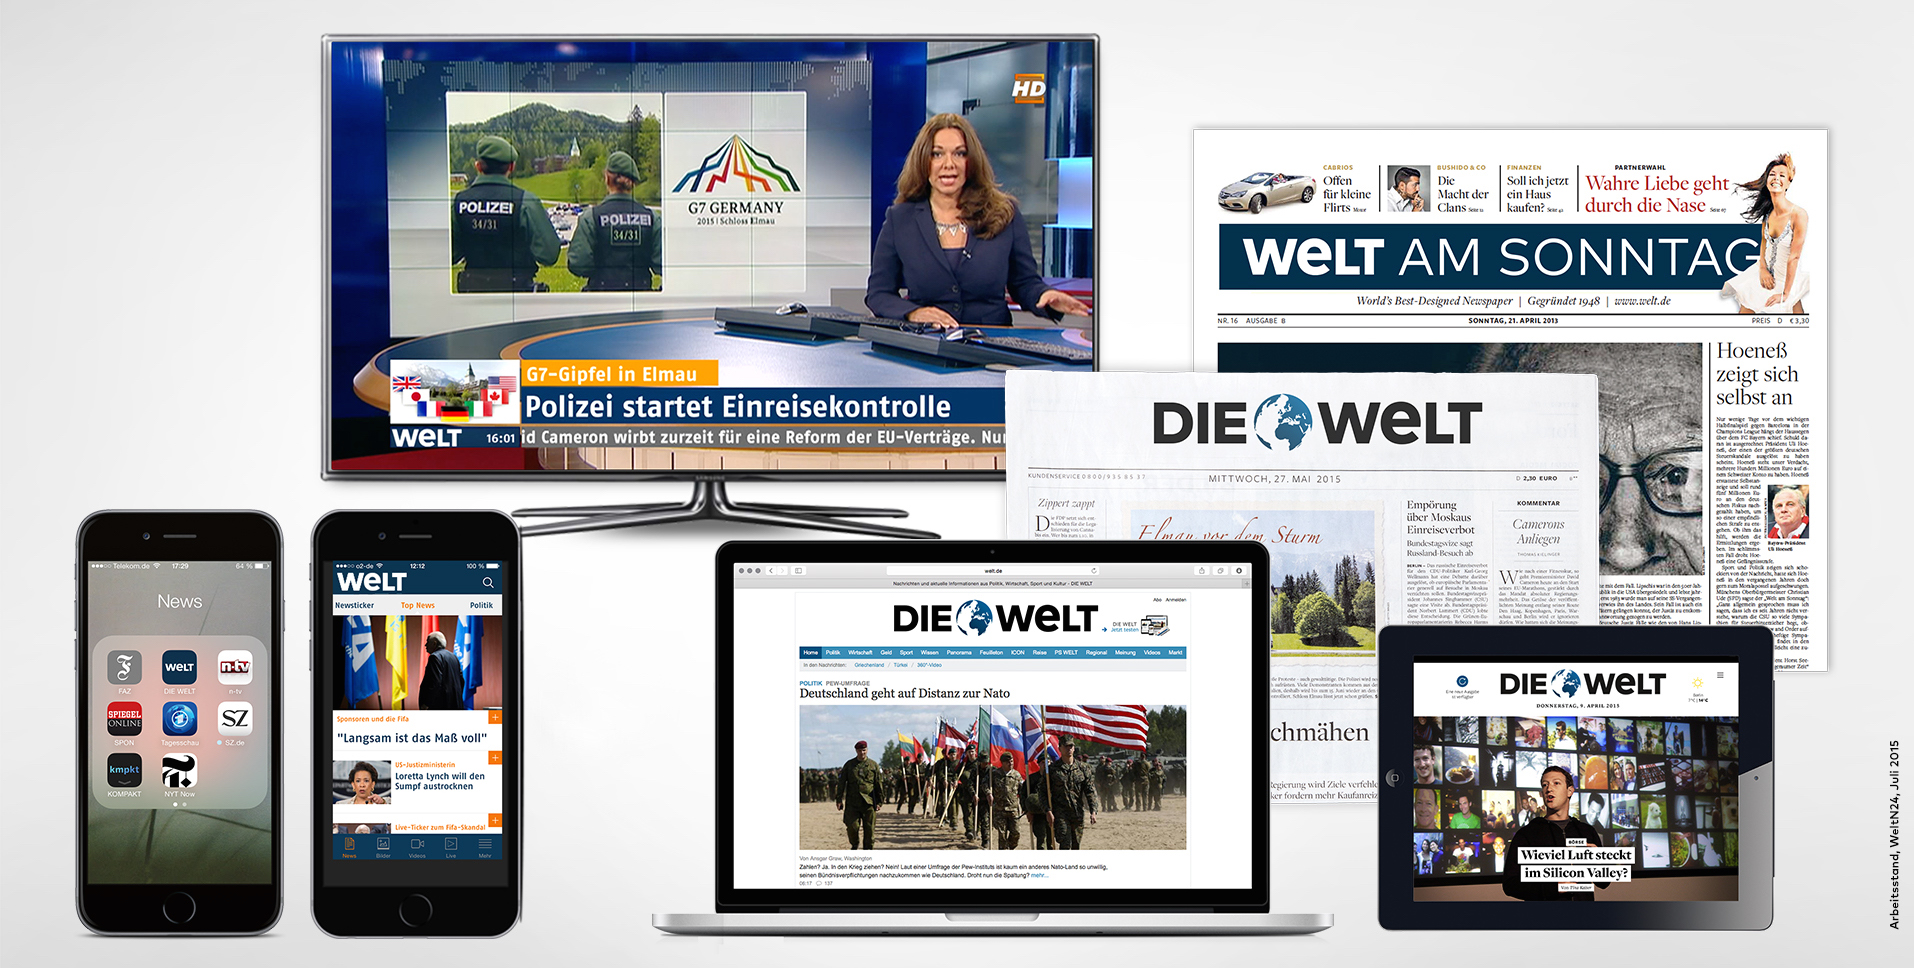 N24 WELT Name Axel Springer Markendach